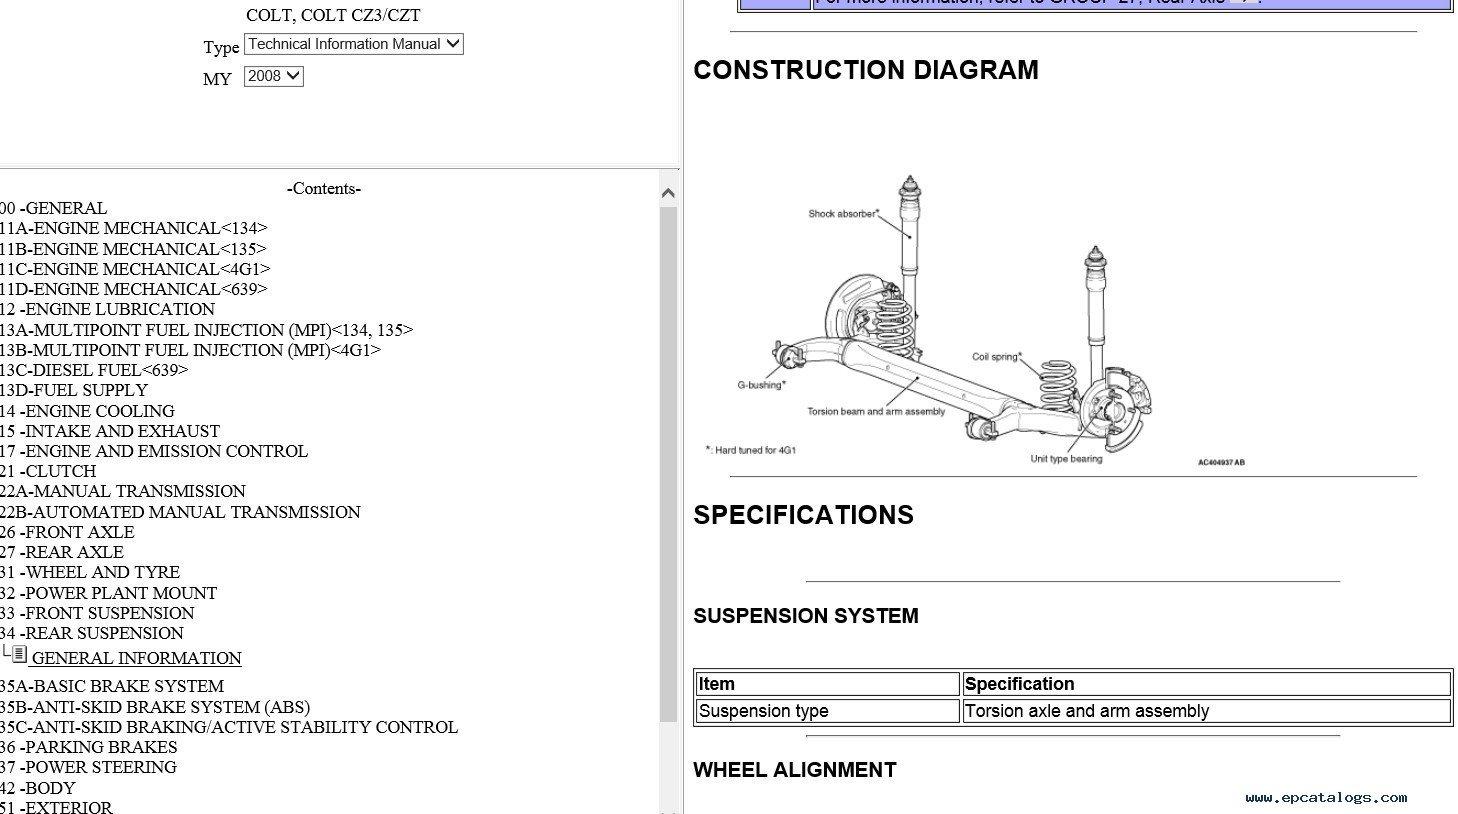 Mitsubishi Colt Czt Wiring Diagram: Mitsubishi Colt (CZ3/CZT)  2008rh:epcatalogs